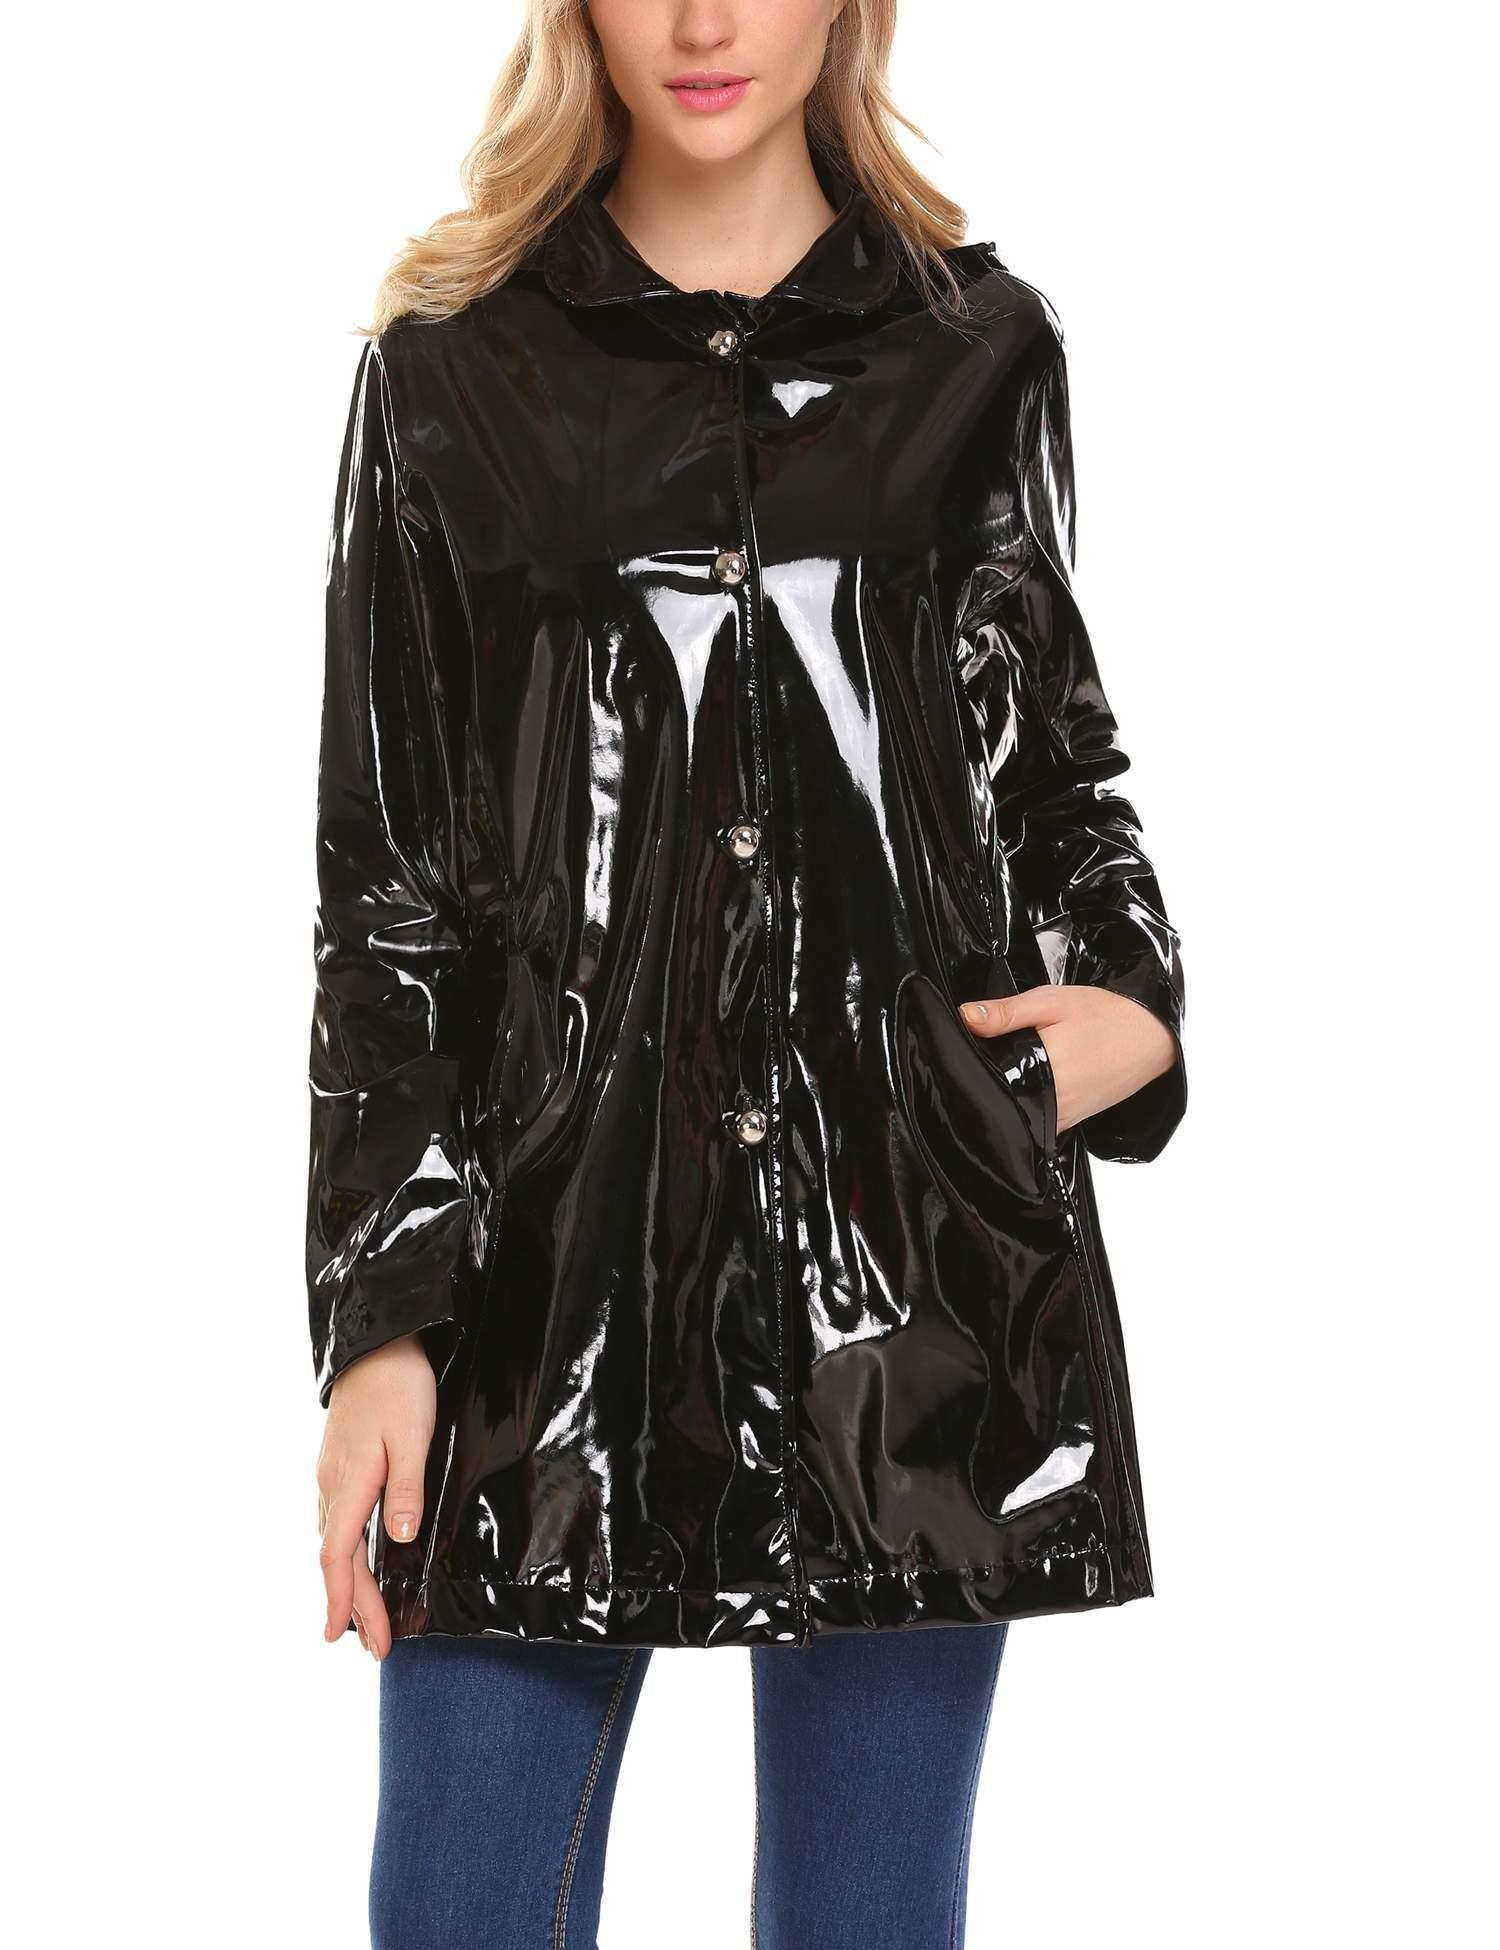 ELESOL Women's Packable Waterproof Rain Jacket Poncho Raincoat with Removable Hood Black/S